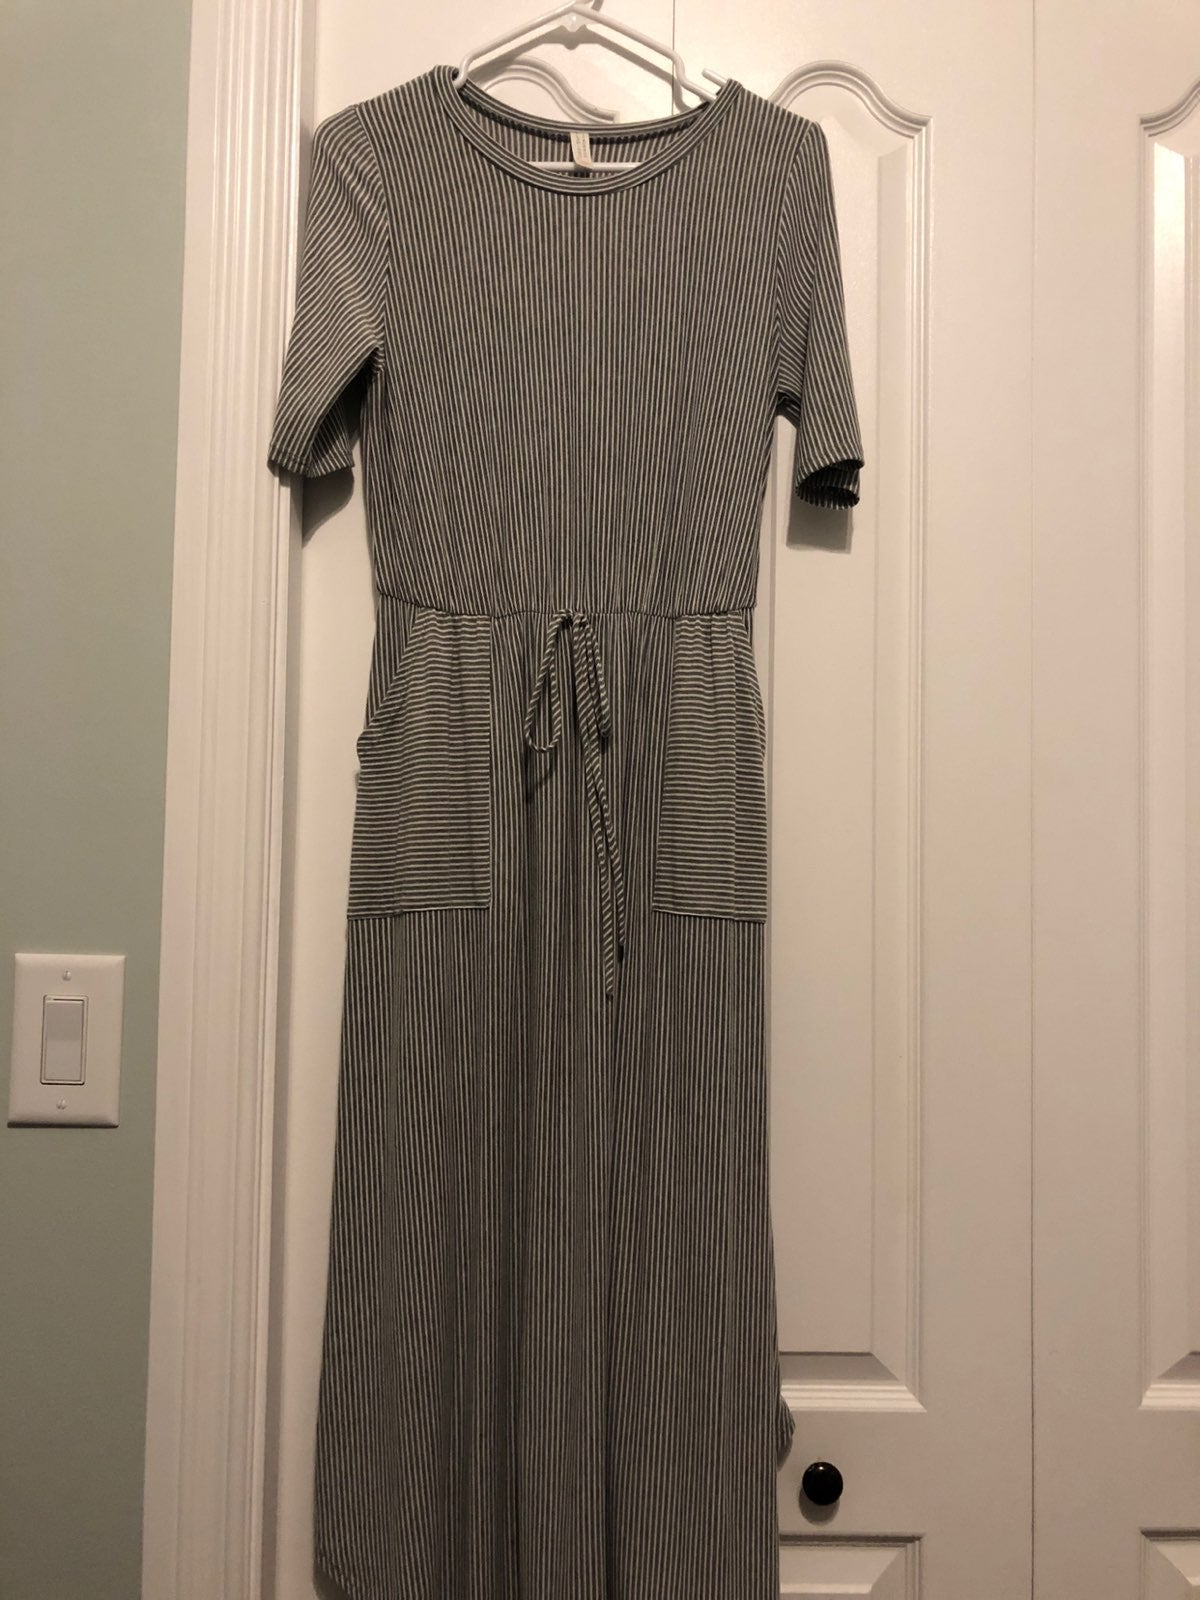 NWOT Women's Midi Dress, Grey & White, M